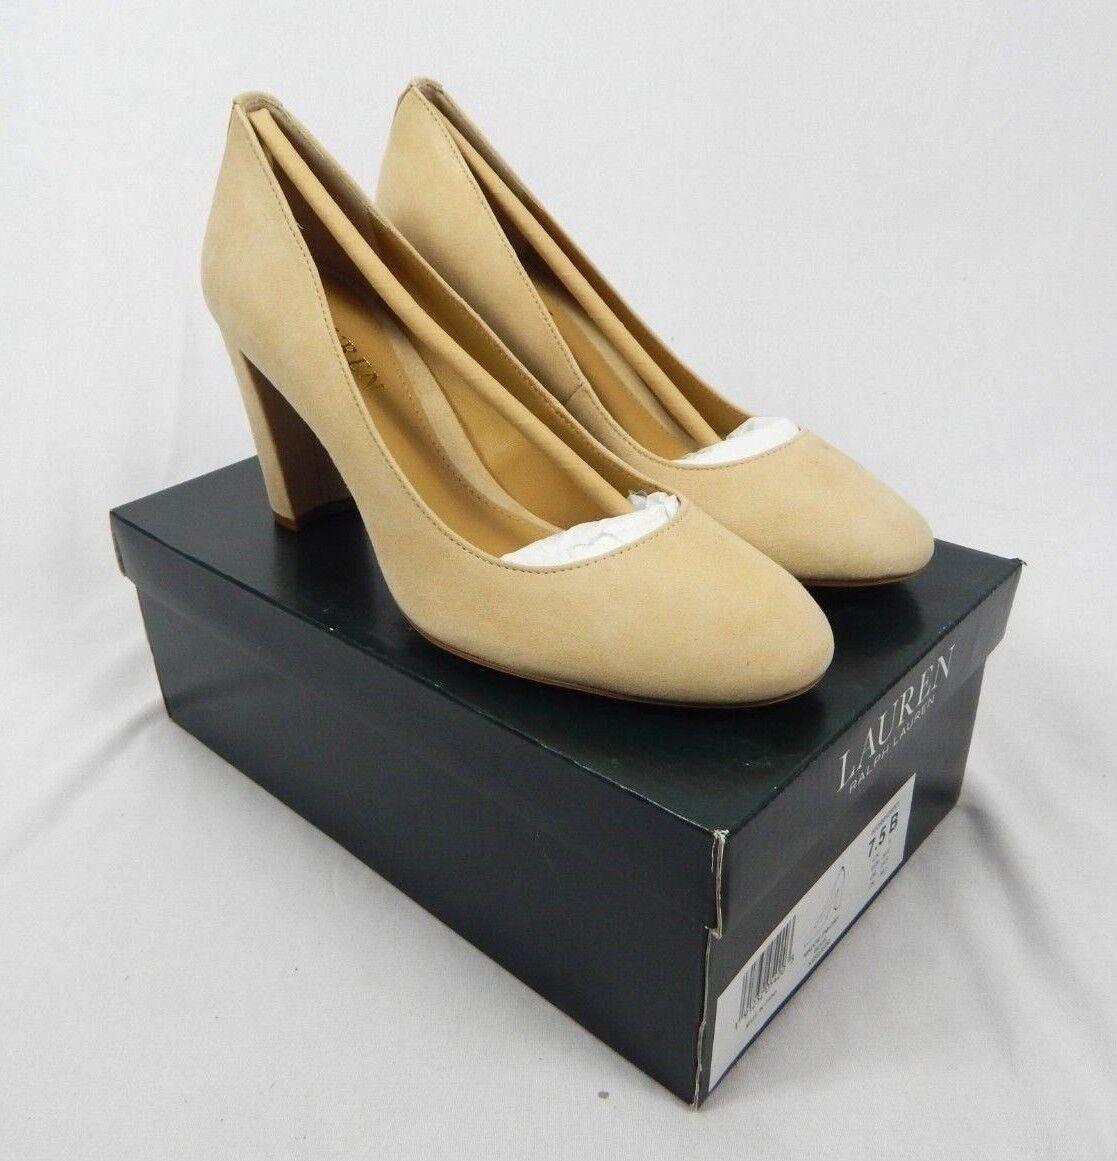 ordinare on-line Ralph Lauren Beige Maddie Pumps High Heels - 7, 7, 7, 7.5, 8.5 B  tempo libero